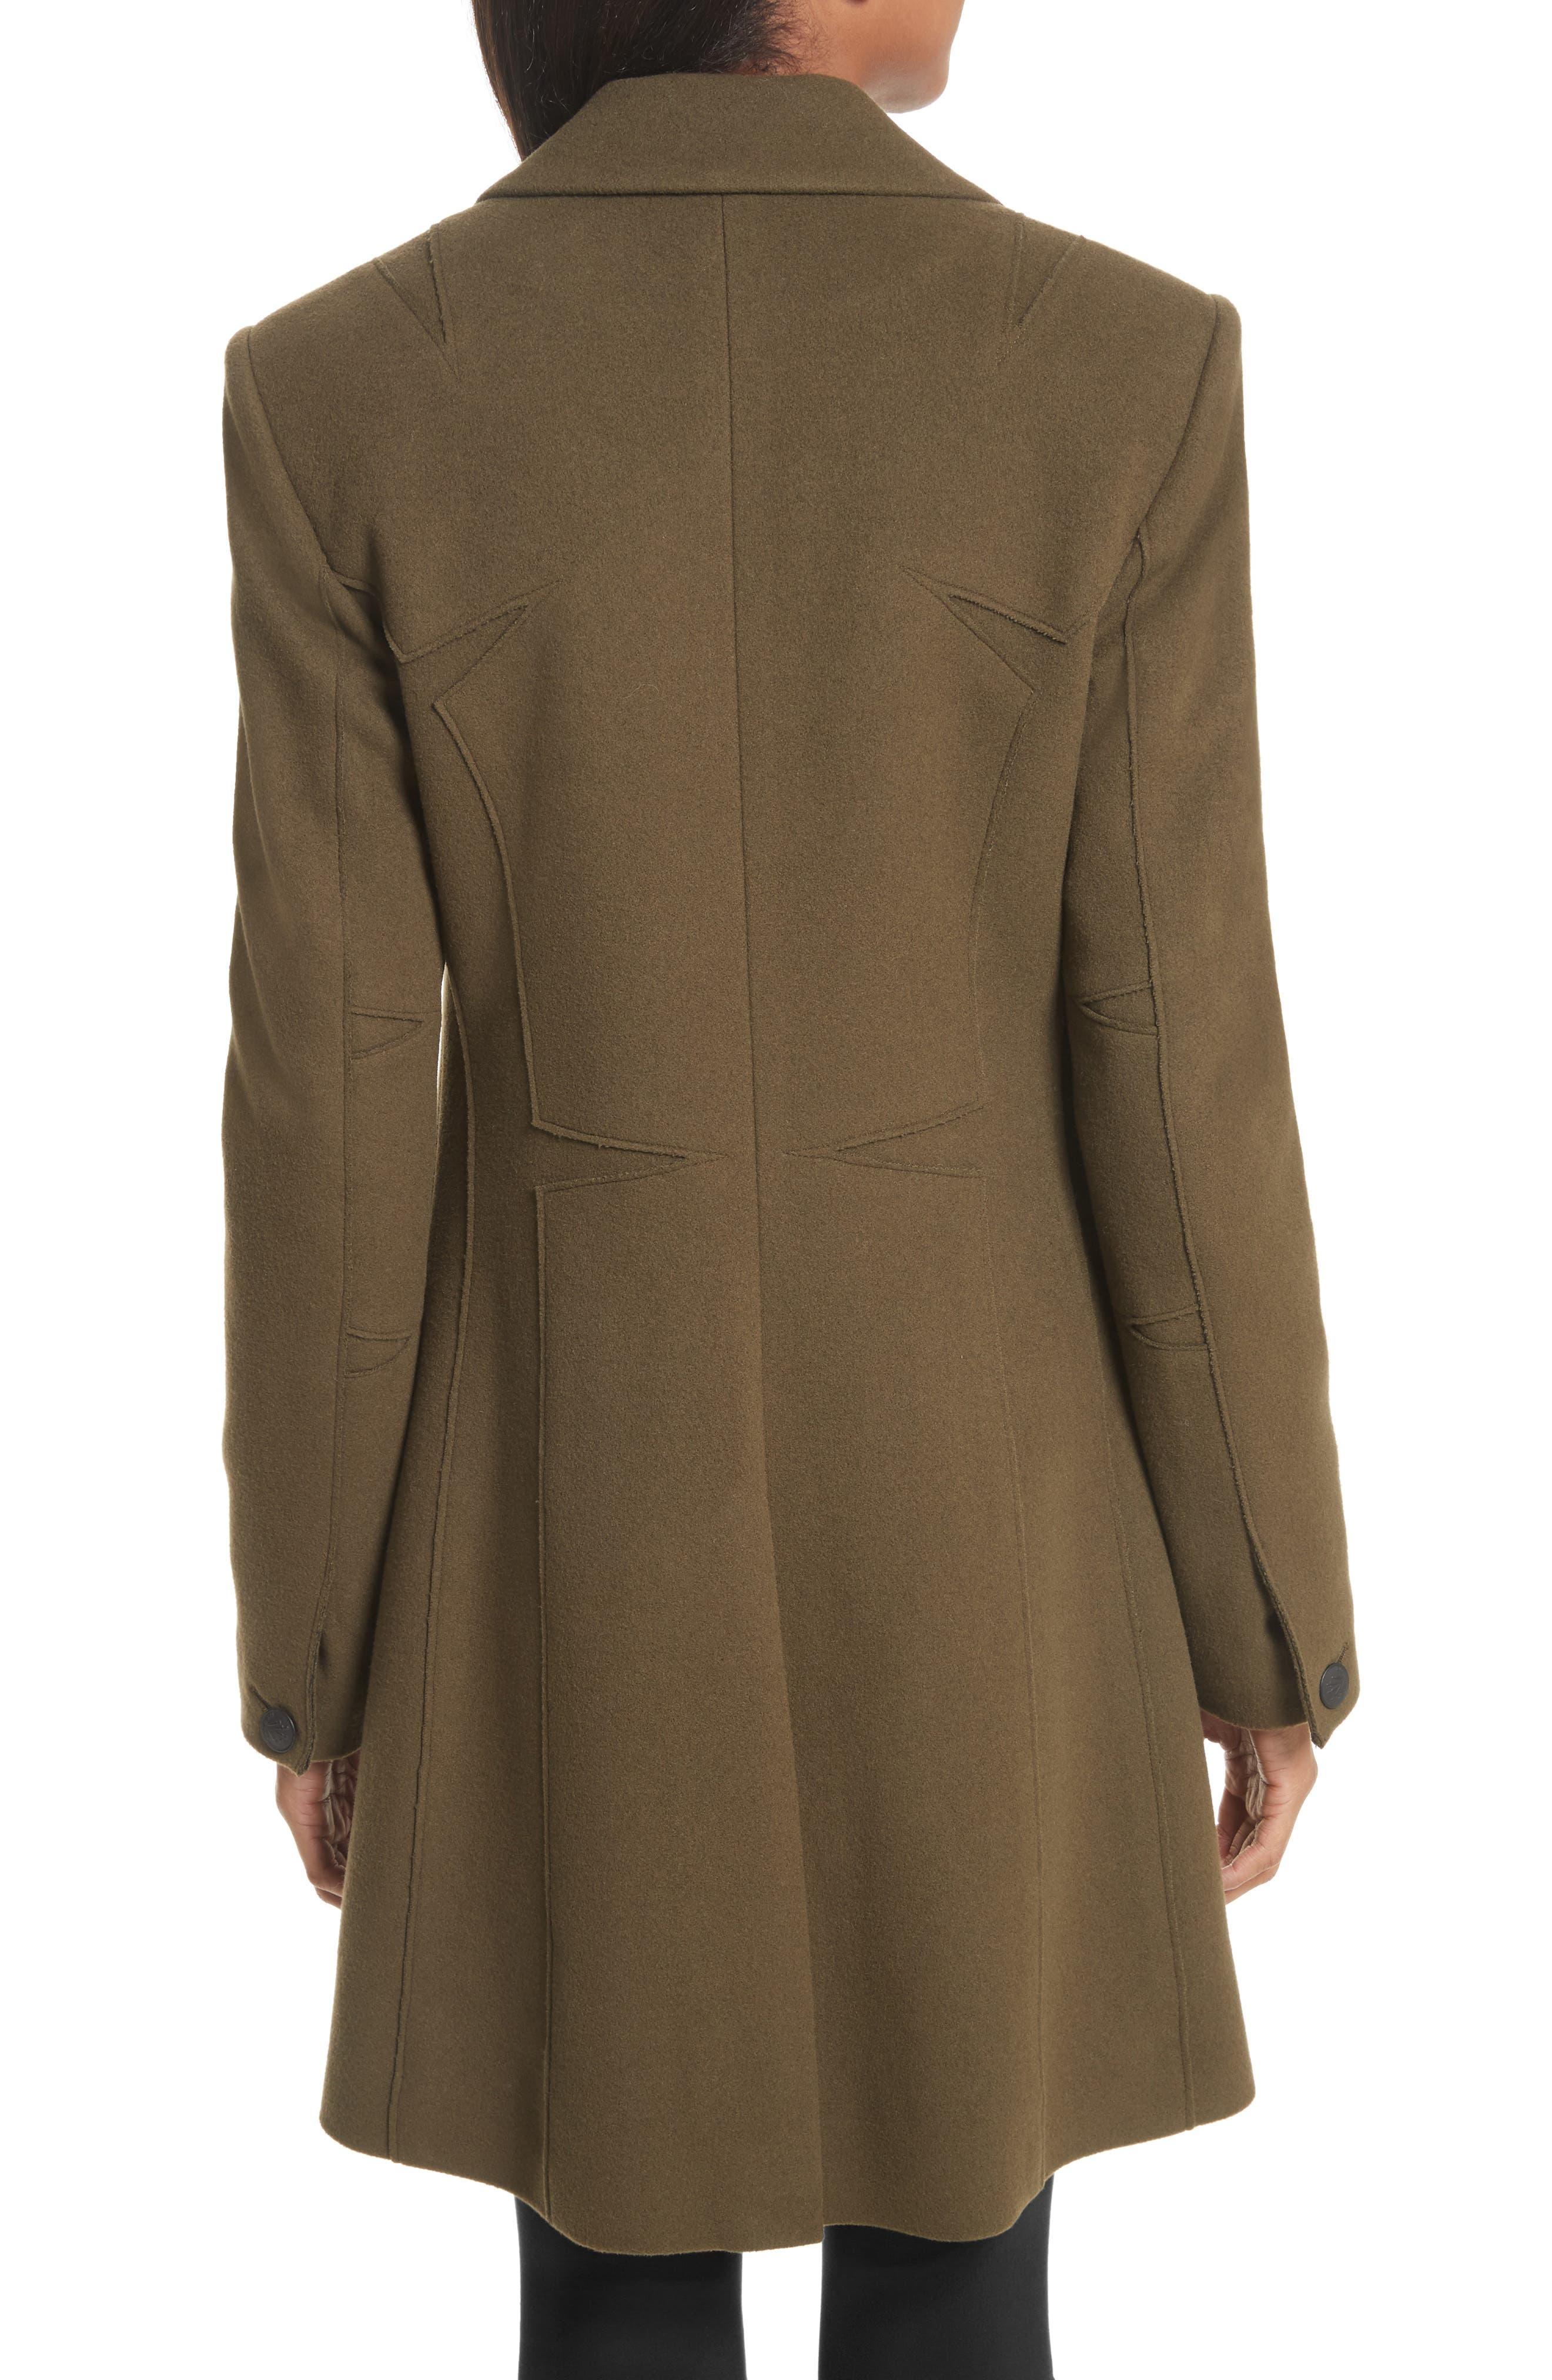 Duchess Wool Blend Coat,                             Alternate thumbnail 3, color,                             Olive